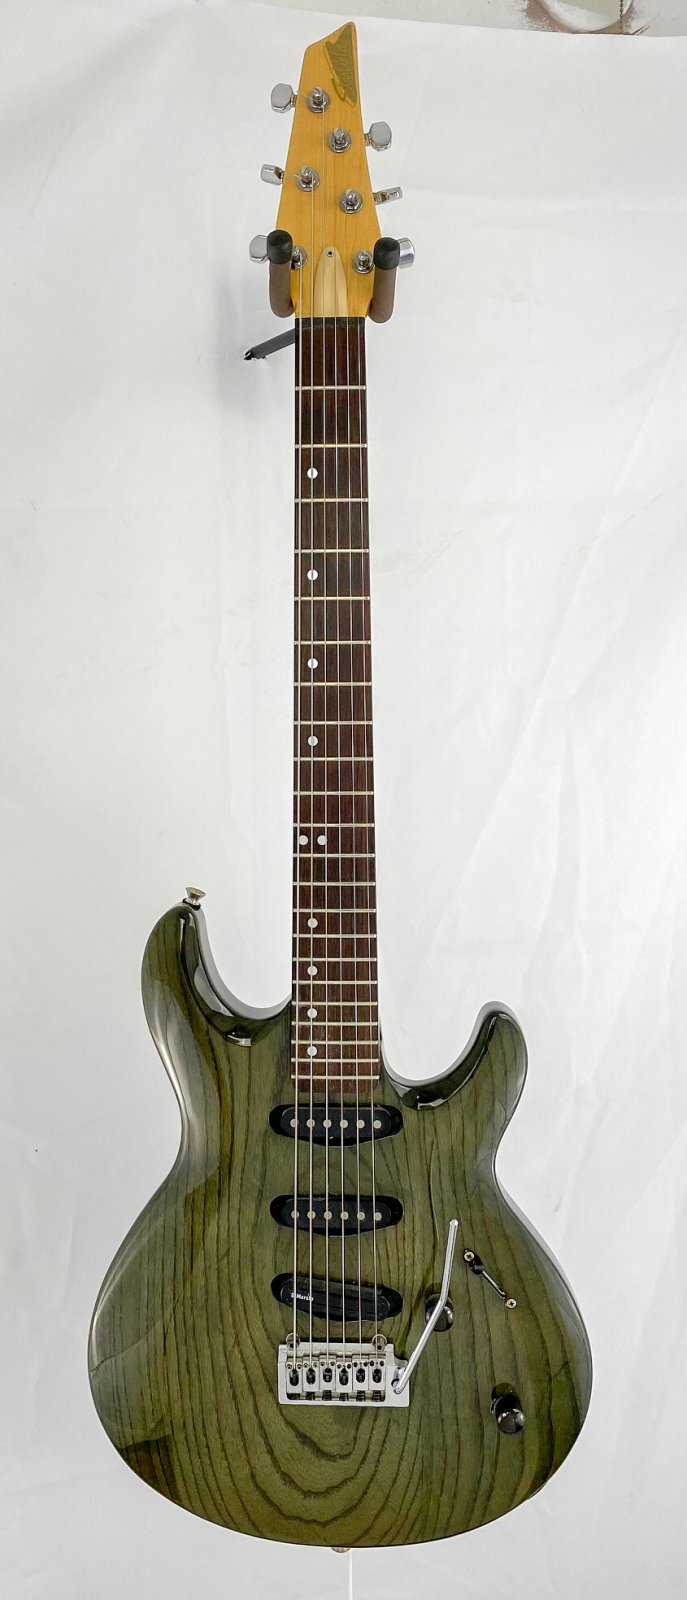 1992 Starfield Altair Sj Custom - w/case